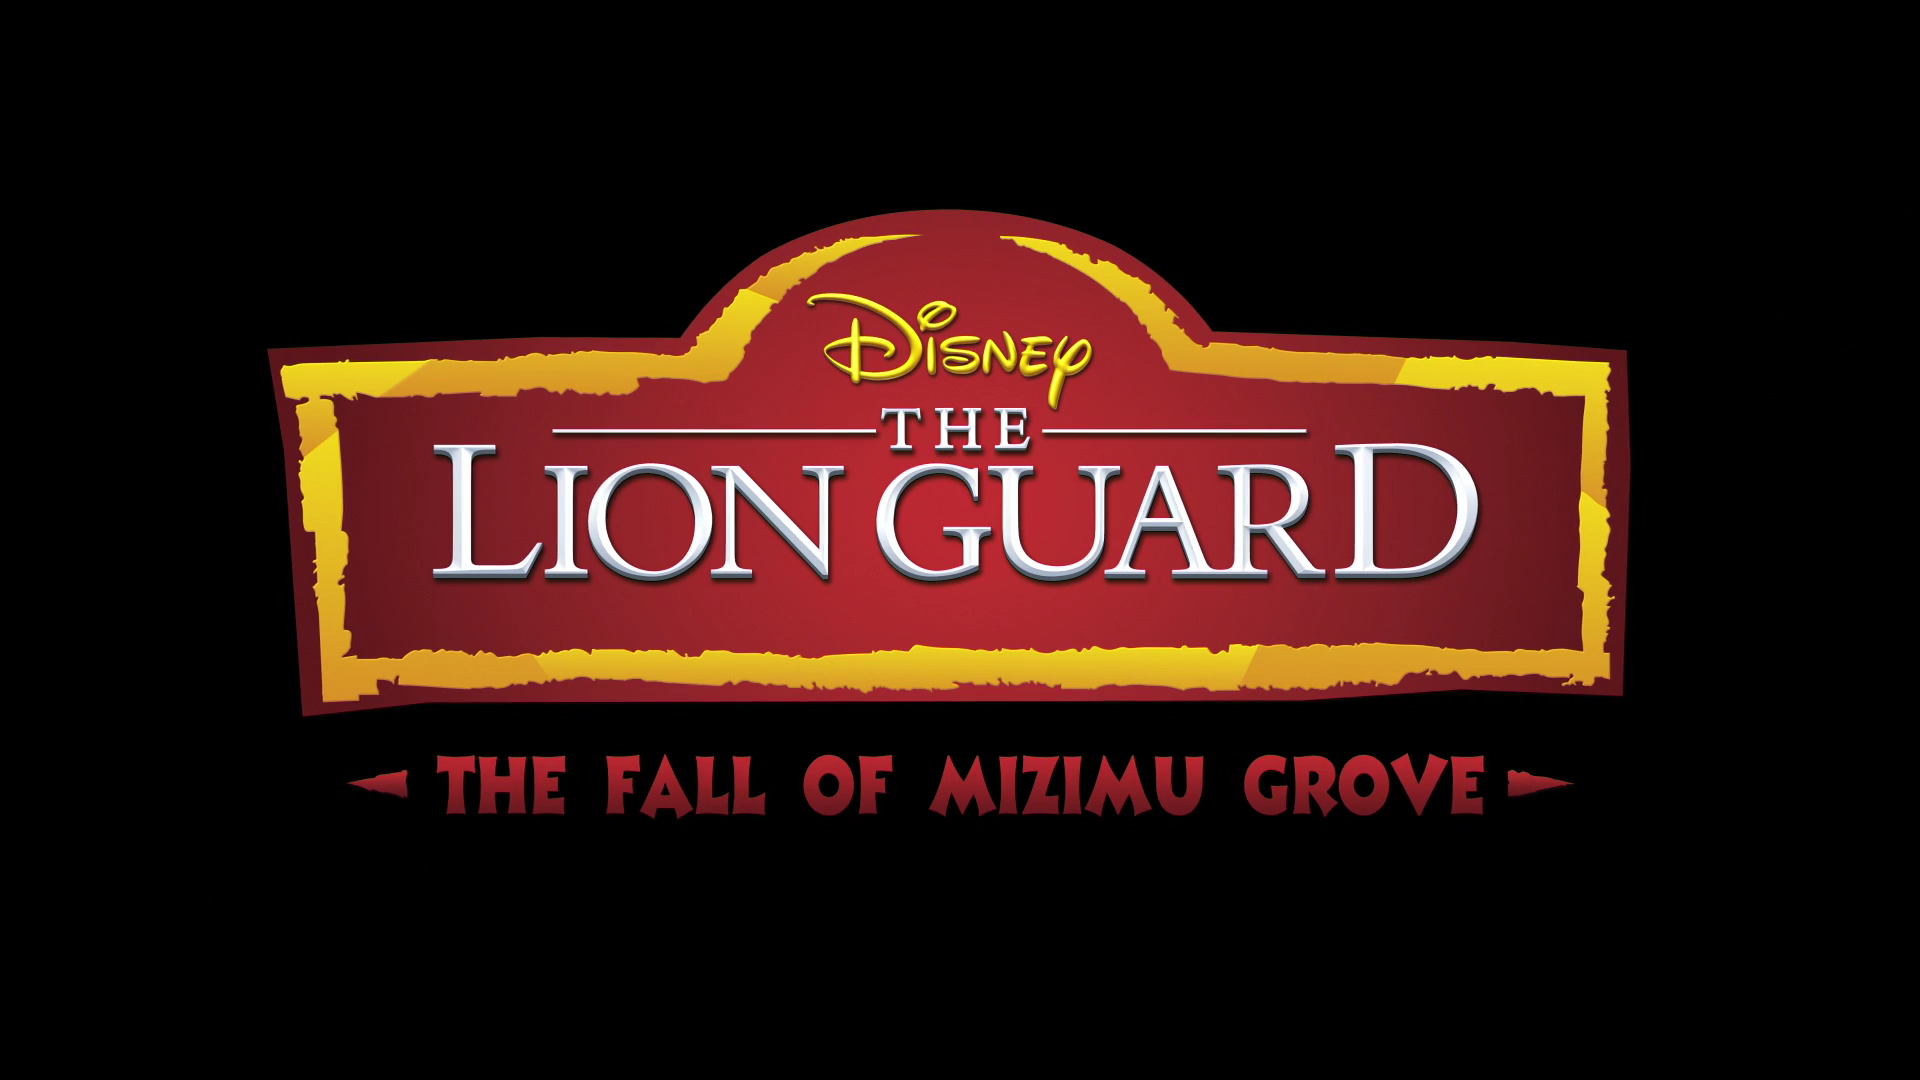 The Fall of Mizimu Grove